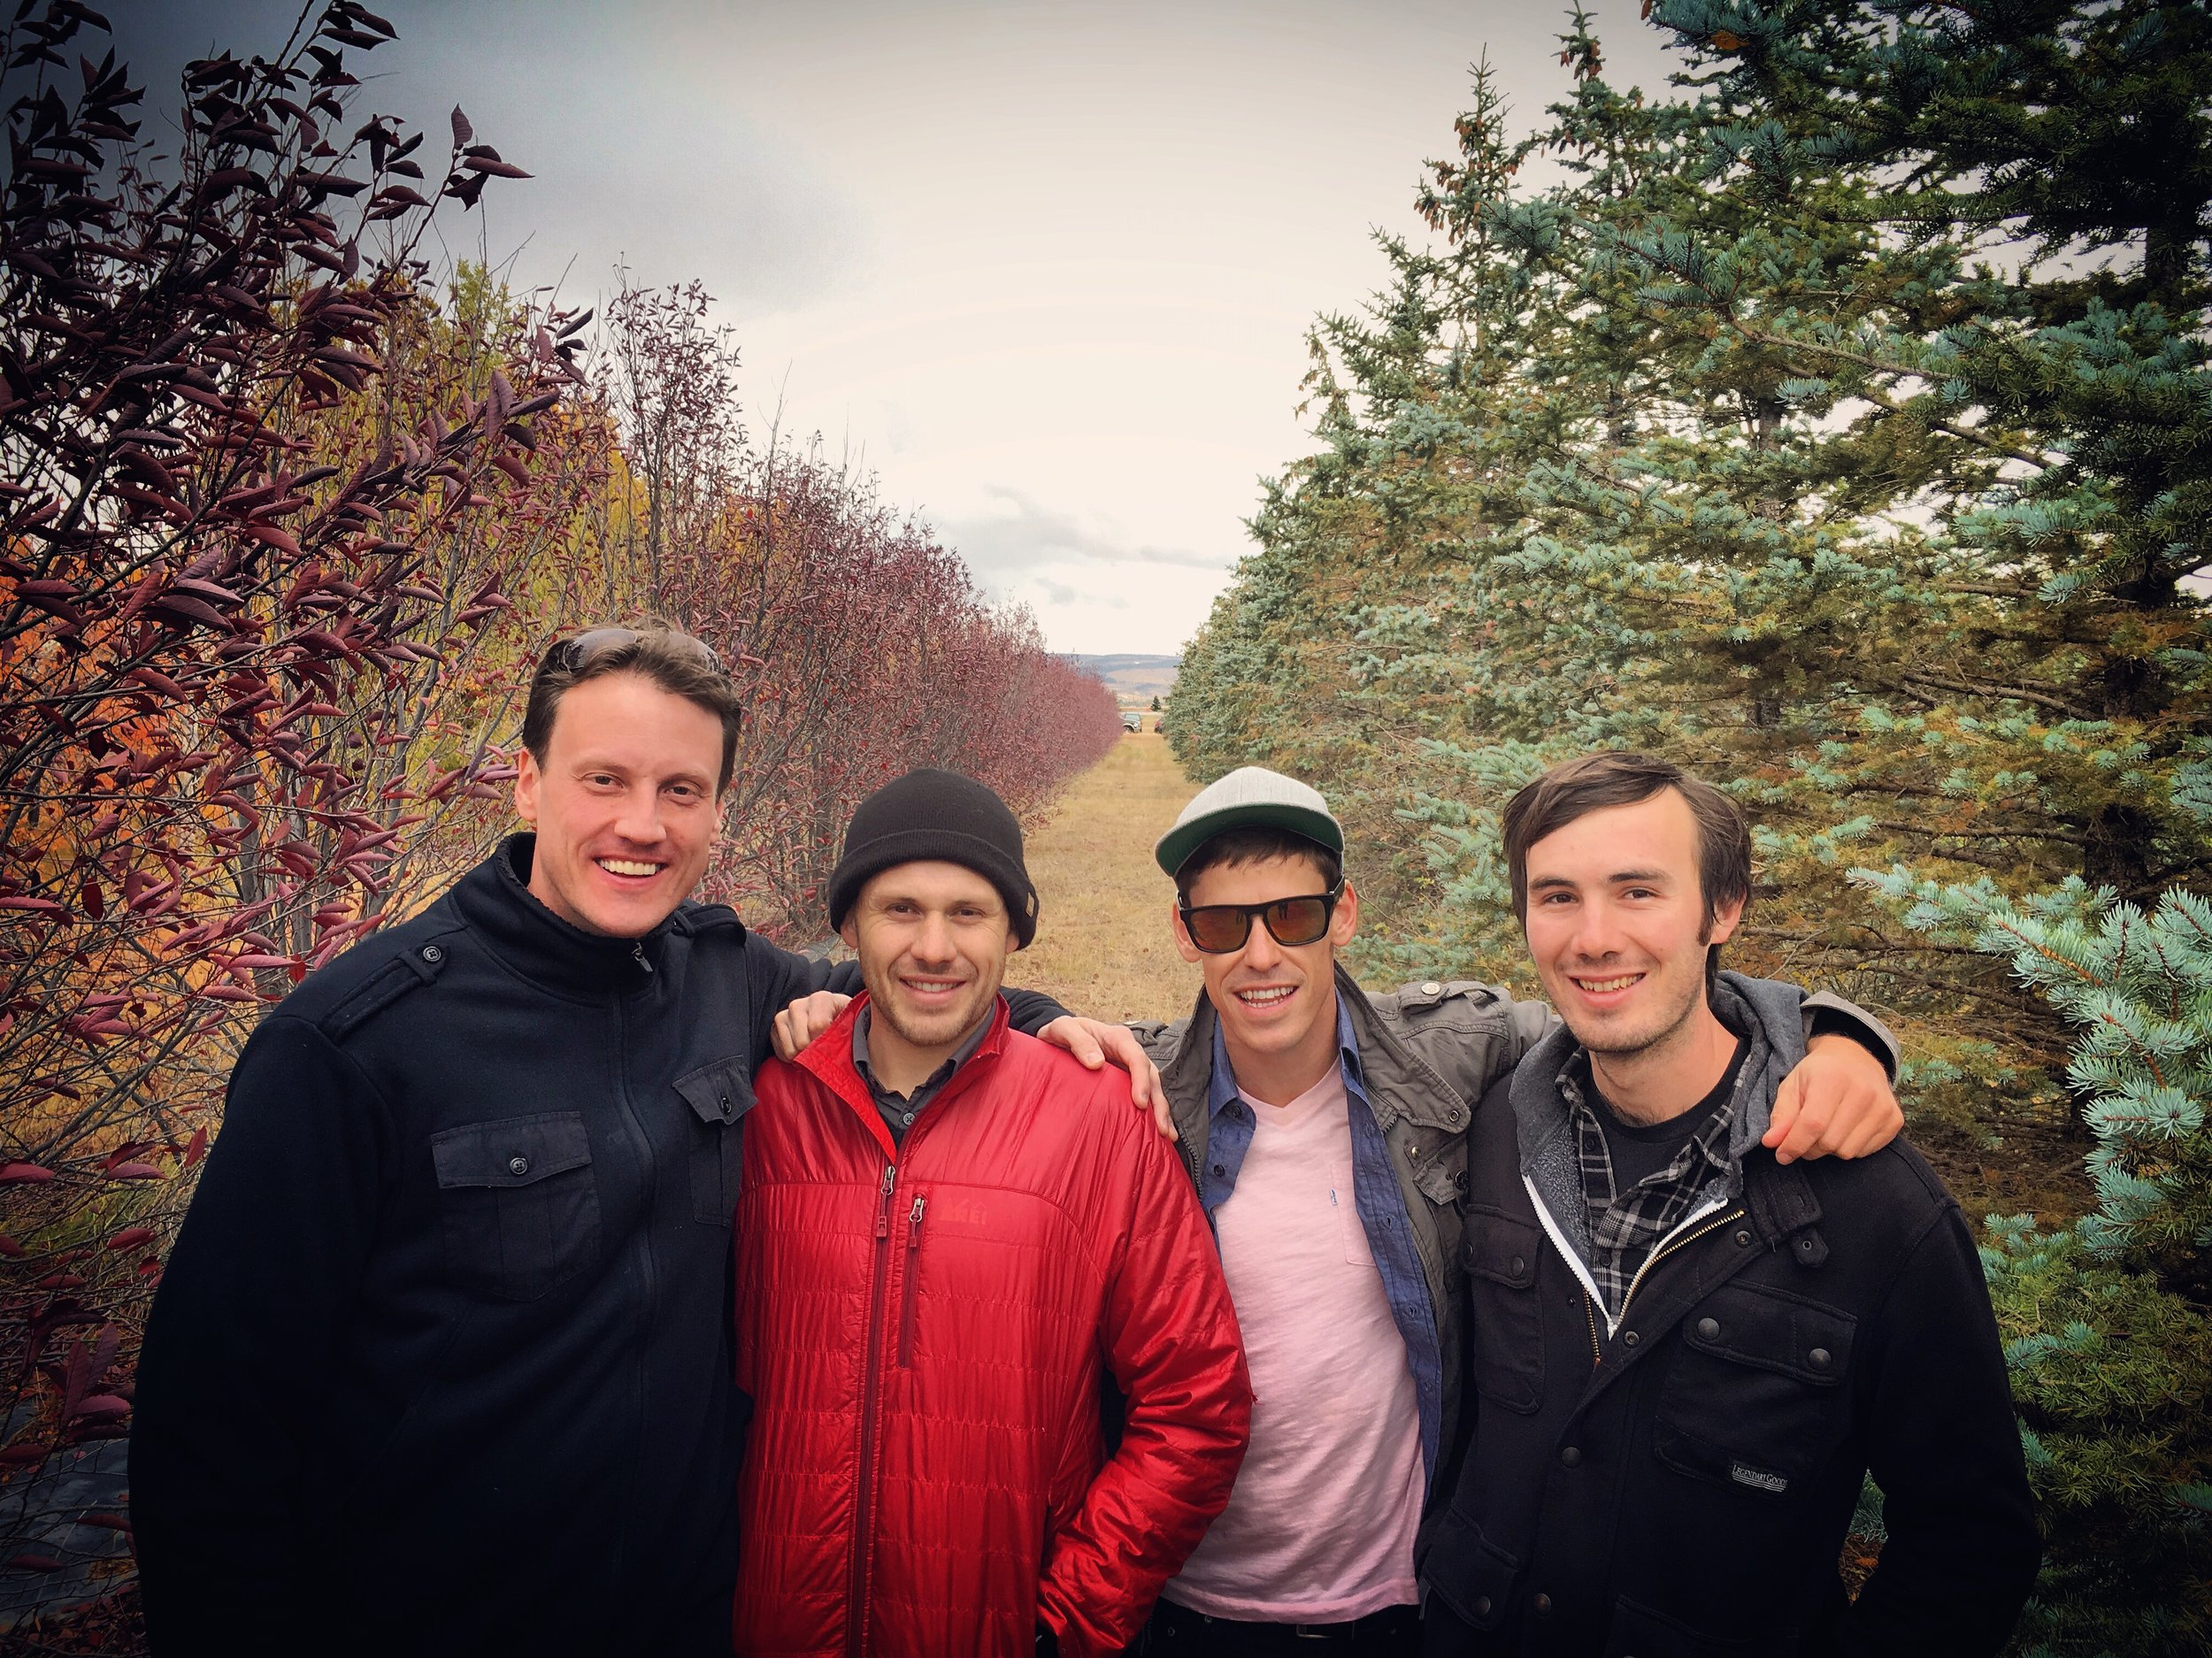 Andy Hackbarth Band 2016 PROMO 4.JPG